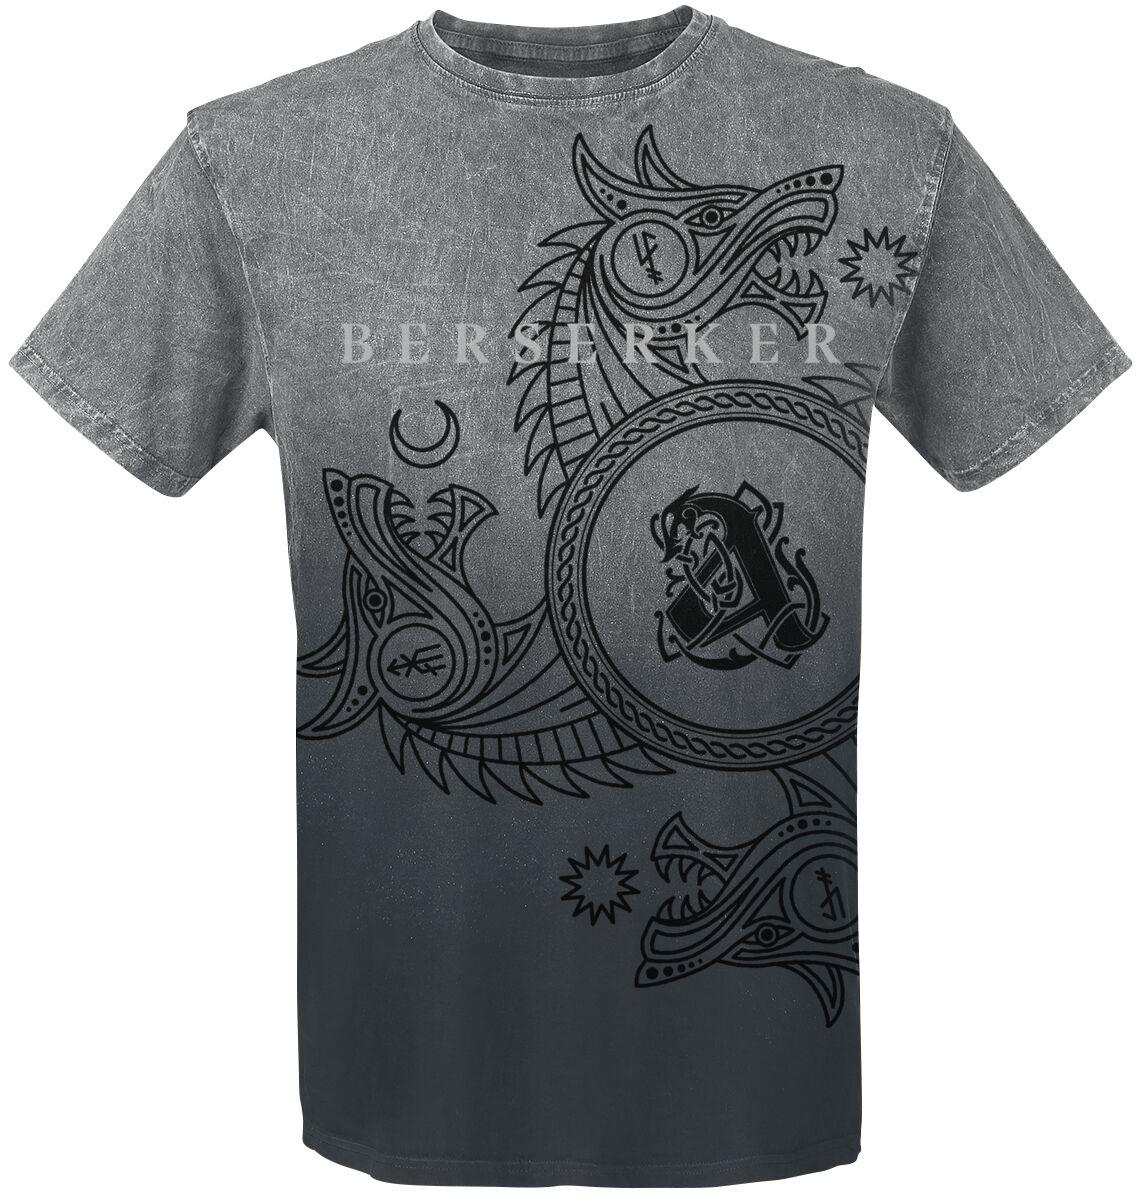 Image of Amon Amarth Berserker T-Shirt dunkelgrau/hellgrau